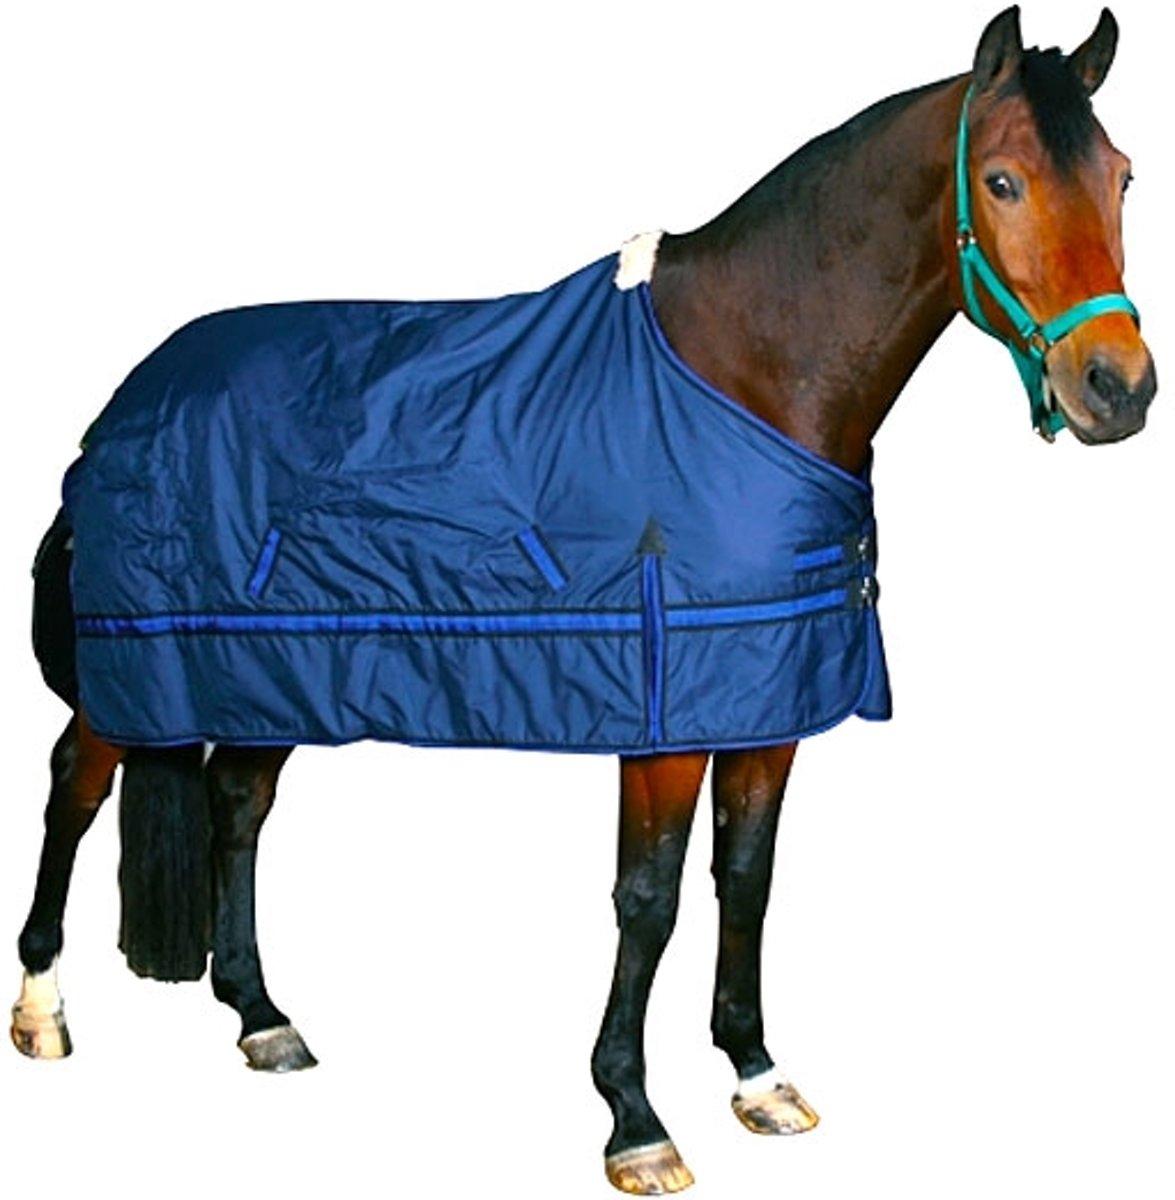 Kerbl Paardendeken Regendeken Paddock waterdicht - Blauw - 0gr/600Den/135cm